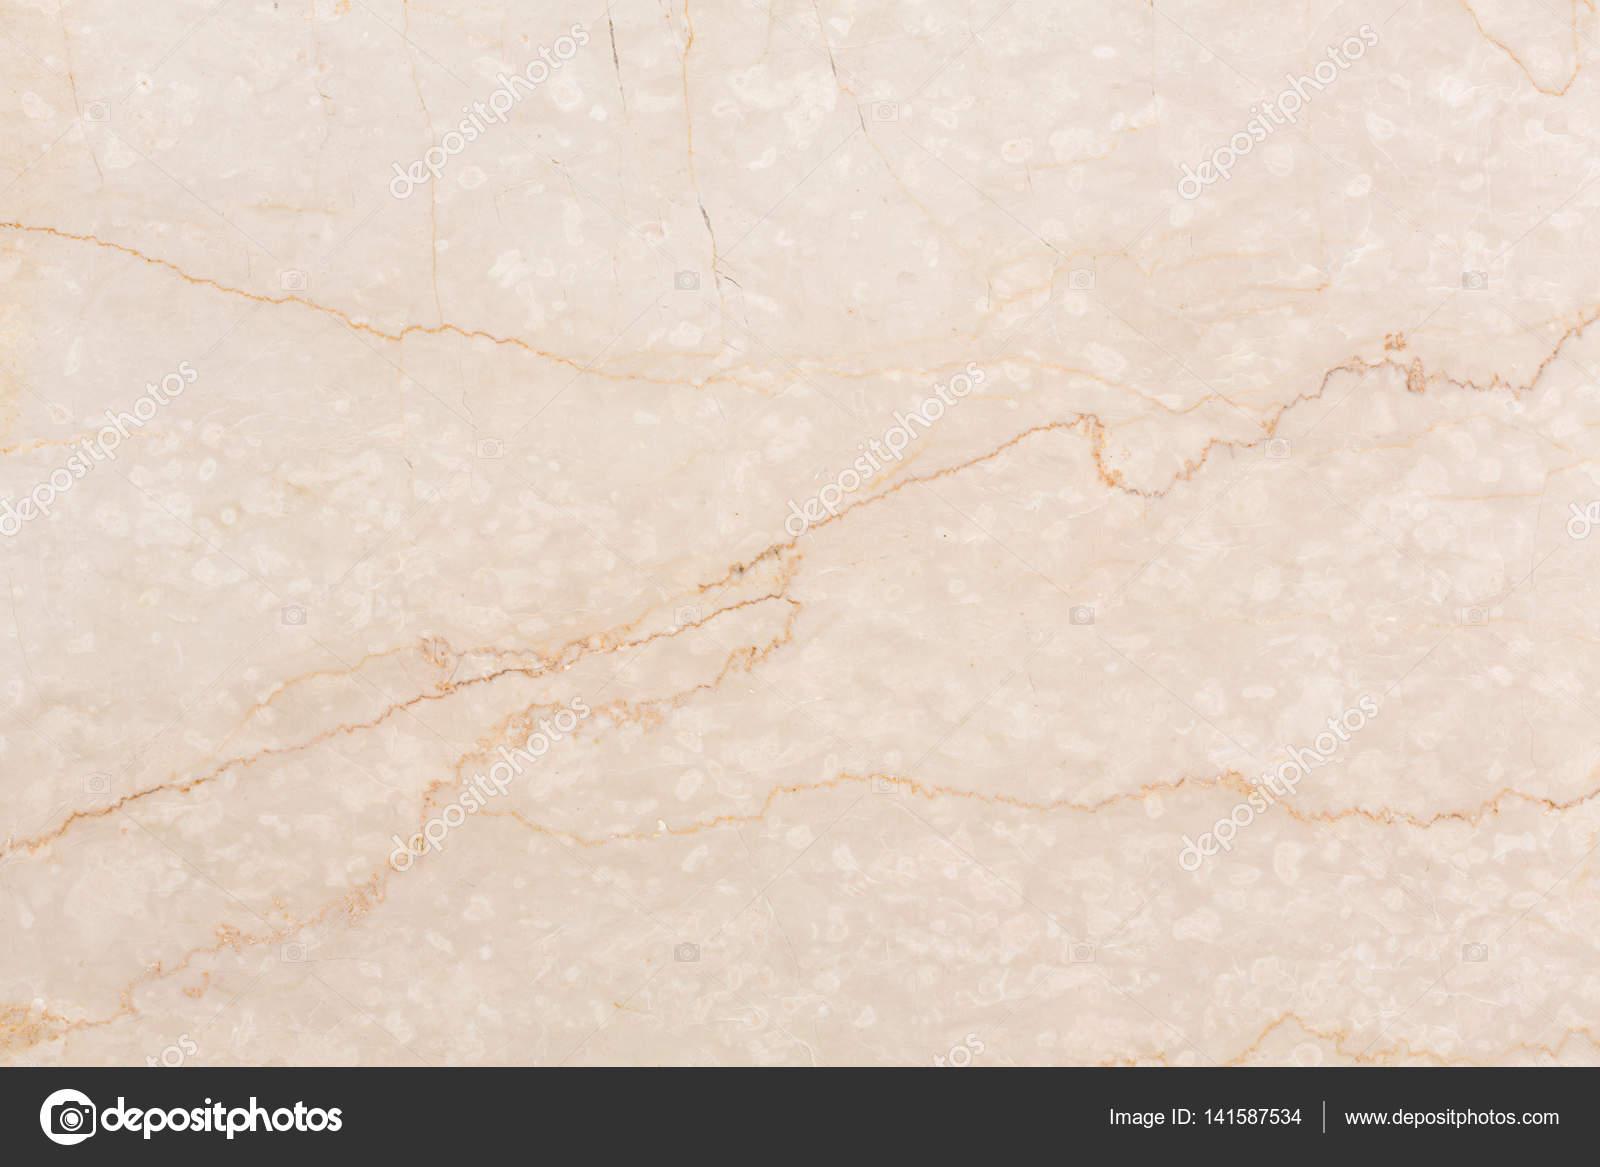 texture marbre beige photographie yamabikay 141587534. Black Bedroom Furniture Sets. Home Design Ideas